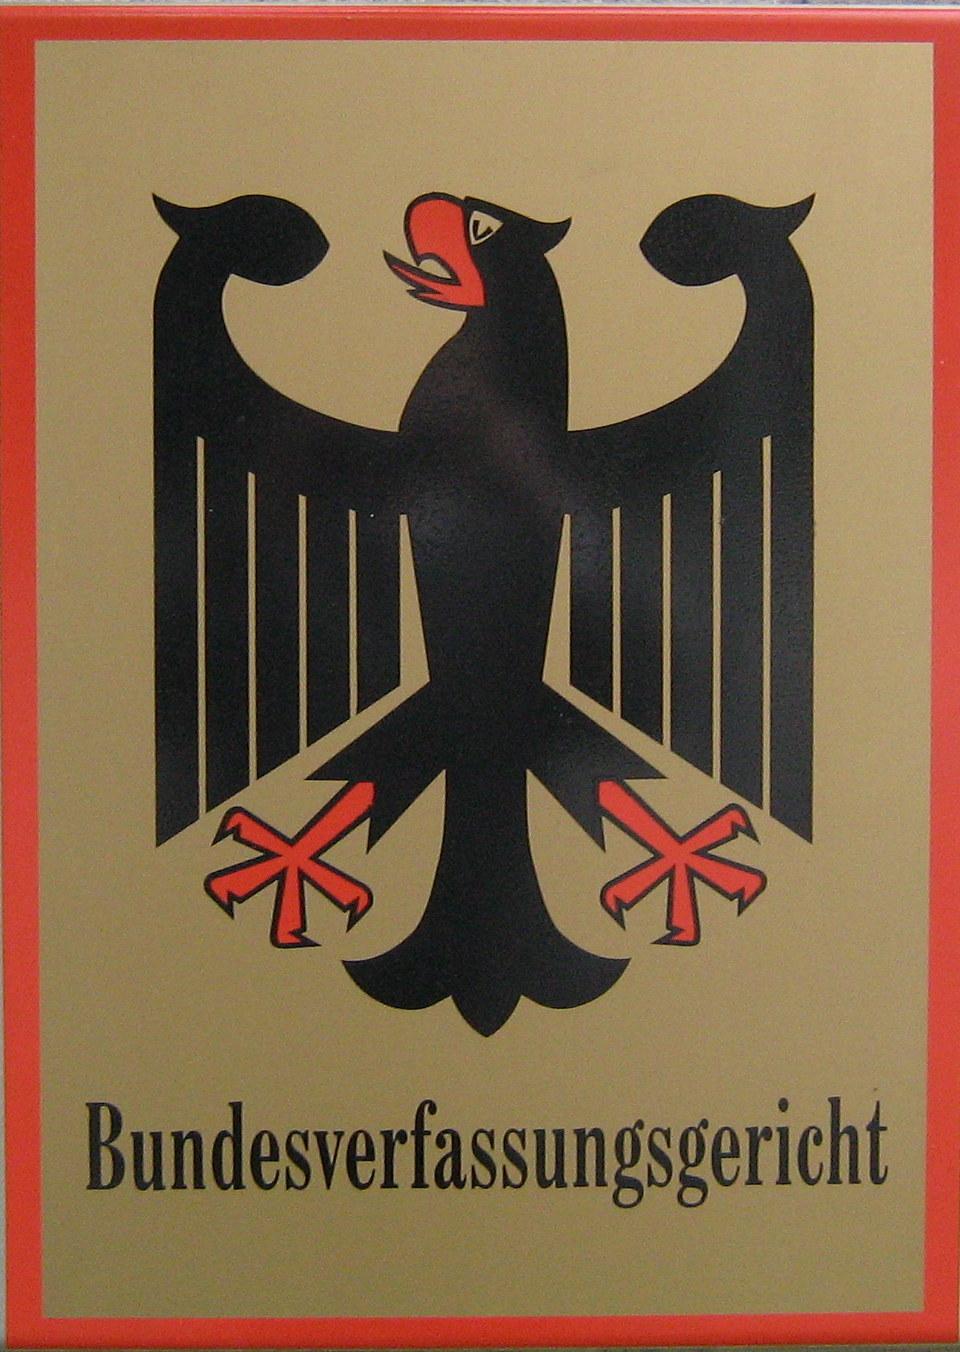 Depiction of Tribunal Constitucional de Alemania